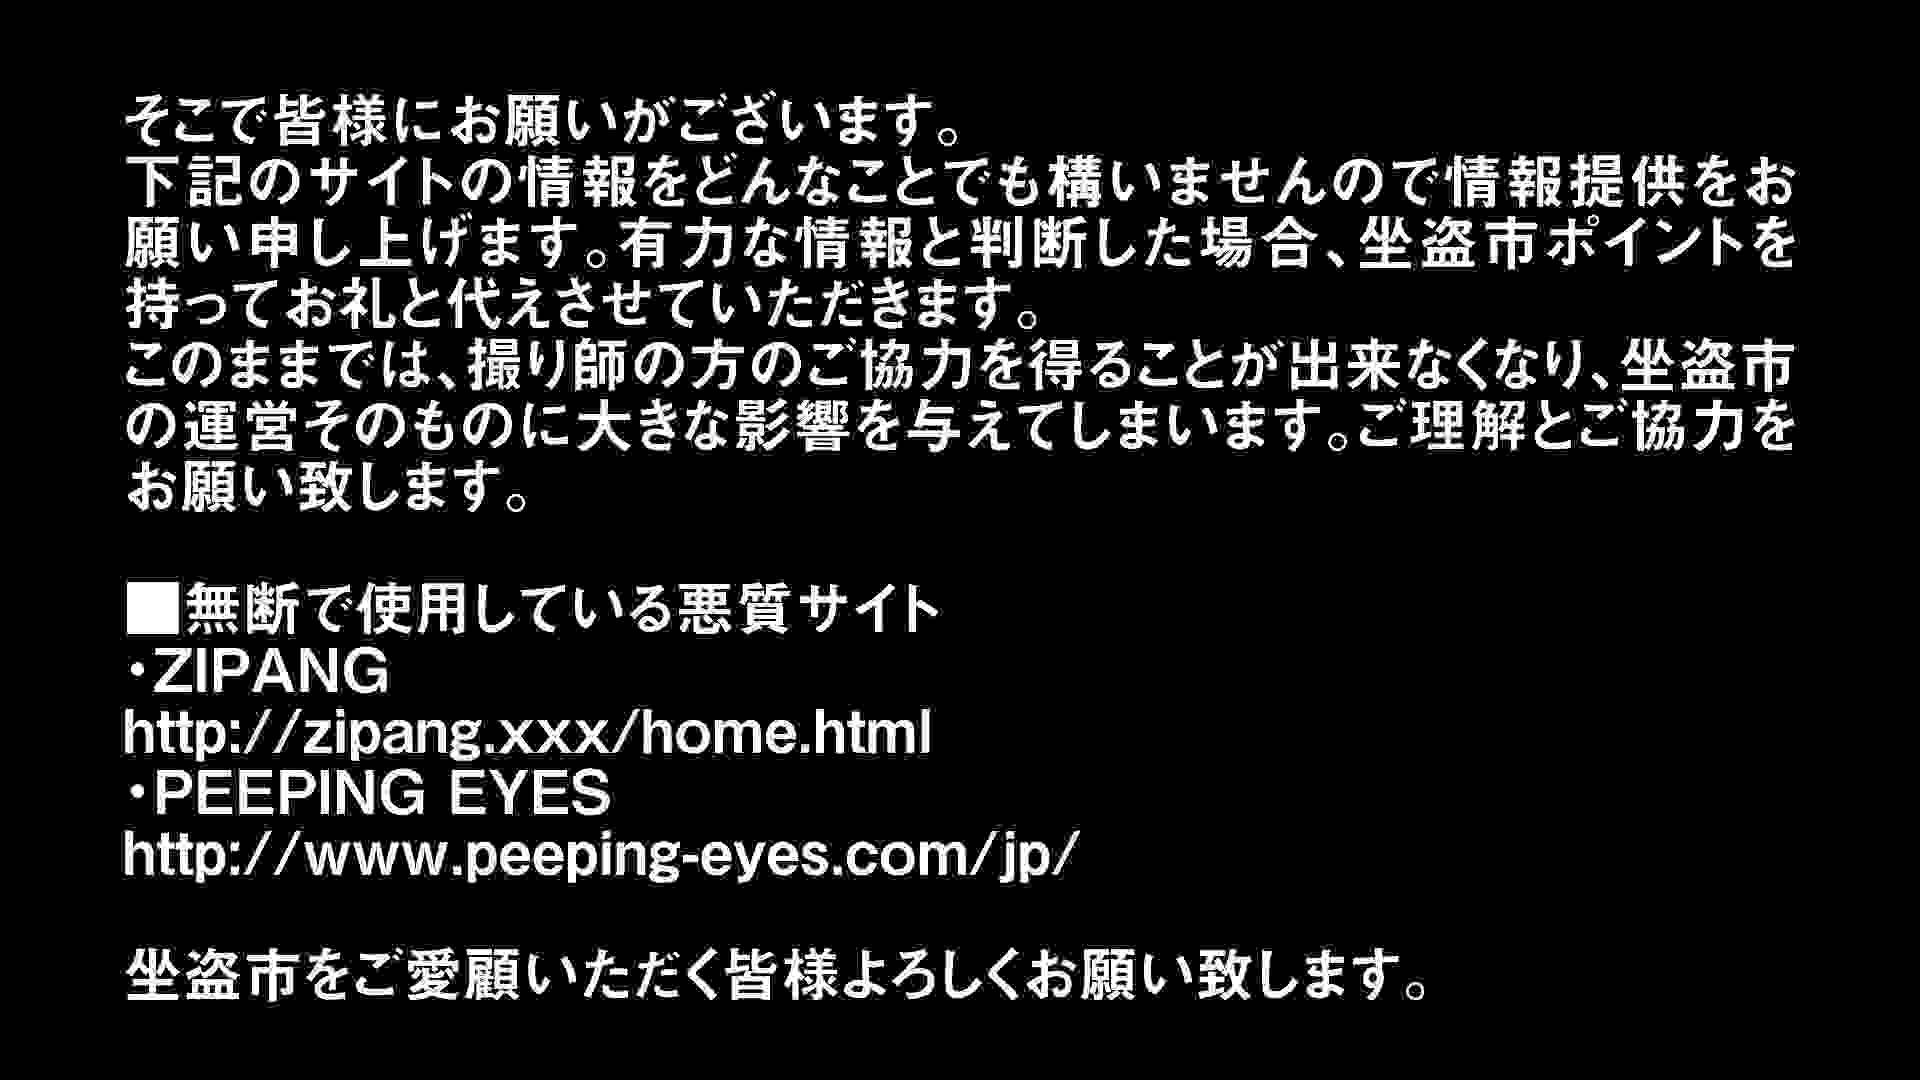 Aquaな露天風呂Vol.302 露天風呂突入 ヌード画像 82pic 23